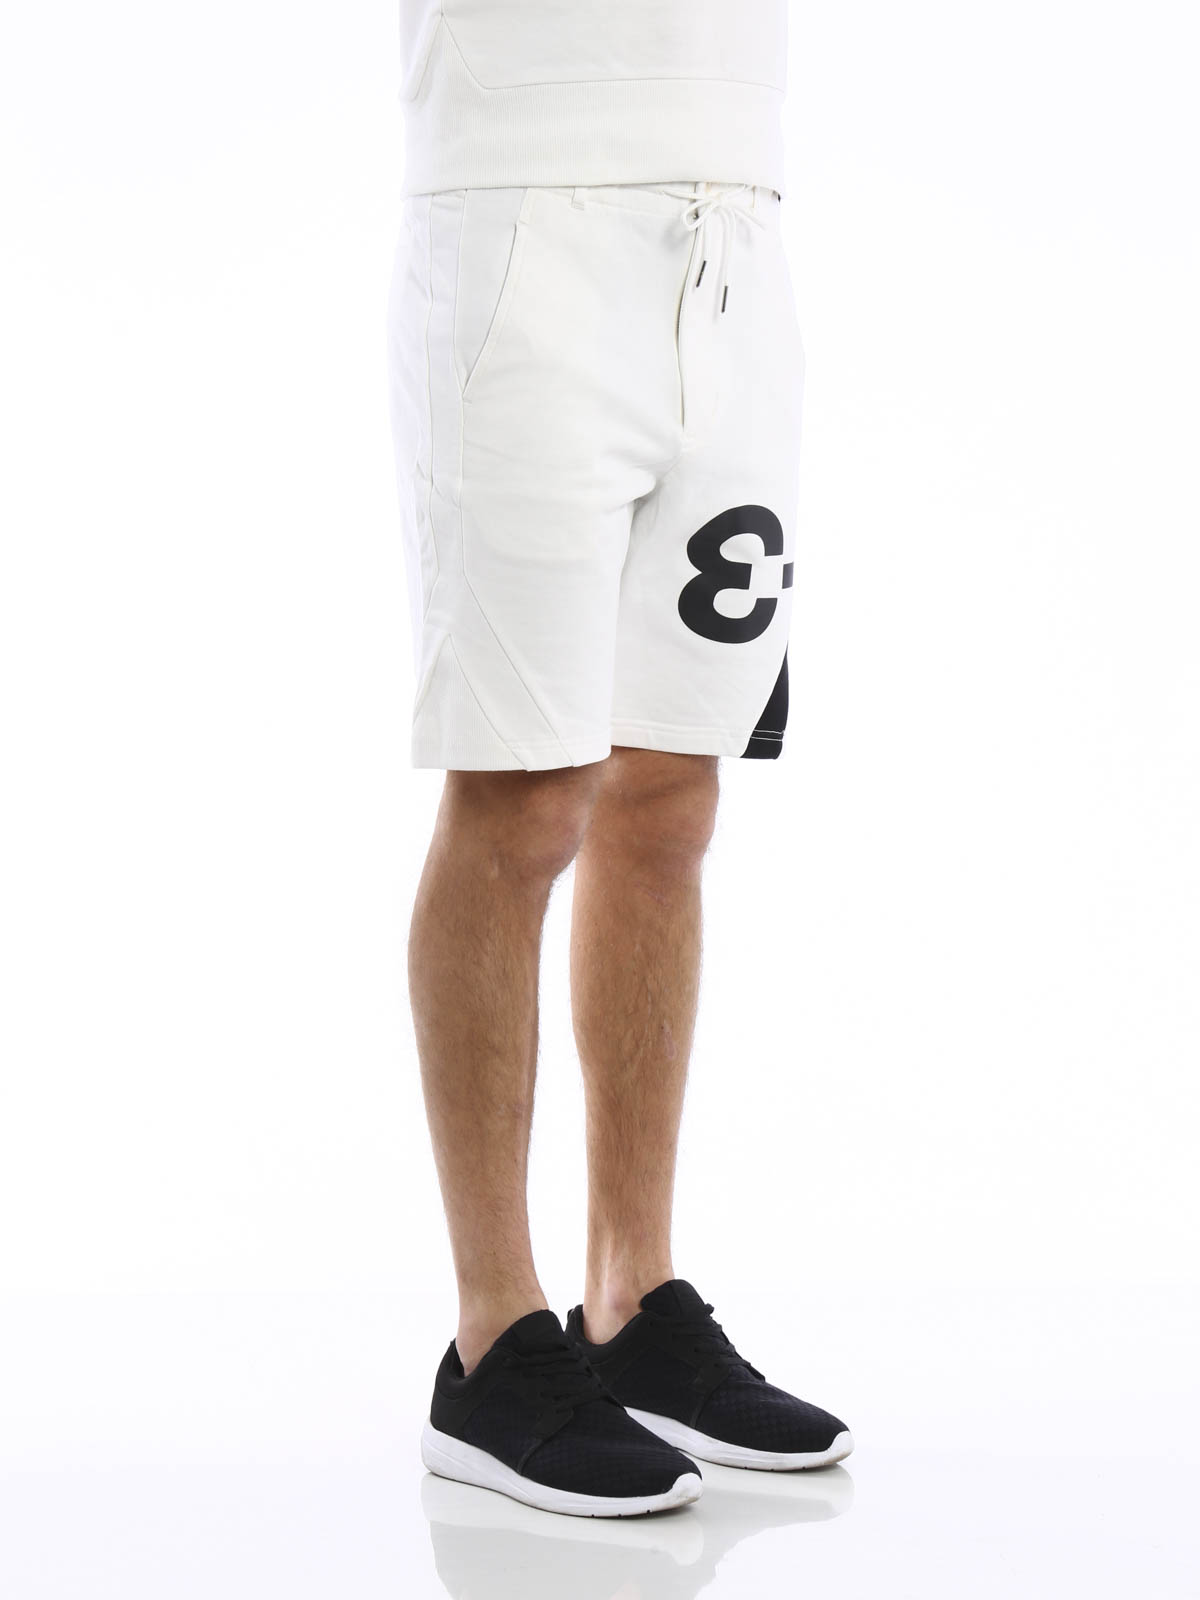 Adidas 3 Pantaloni Ginnastica Corti Y Sport Da BgBqrTx